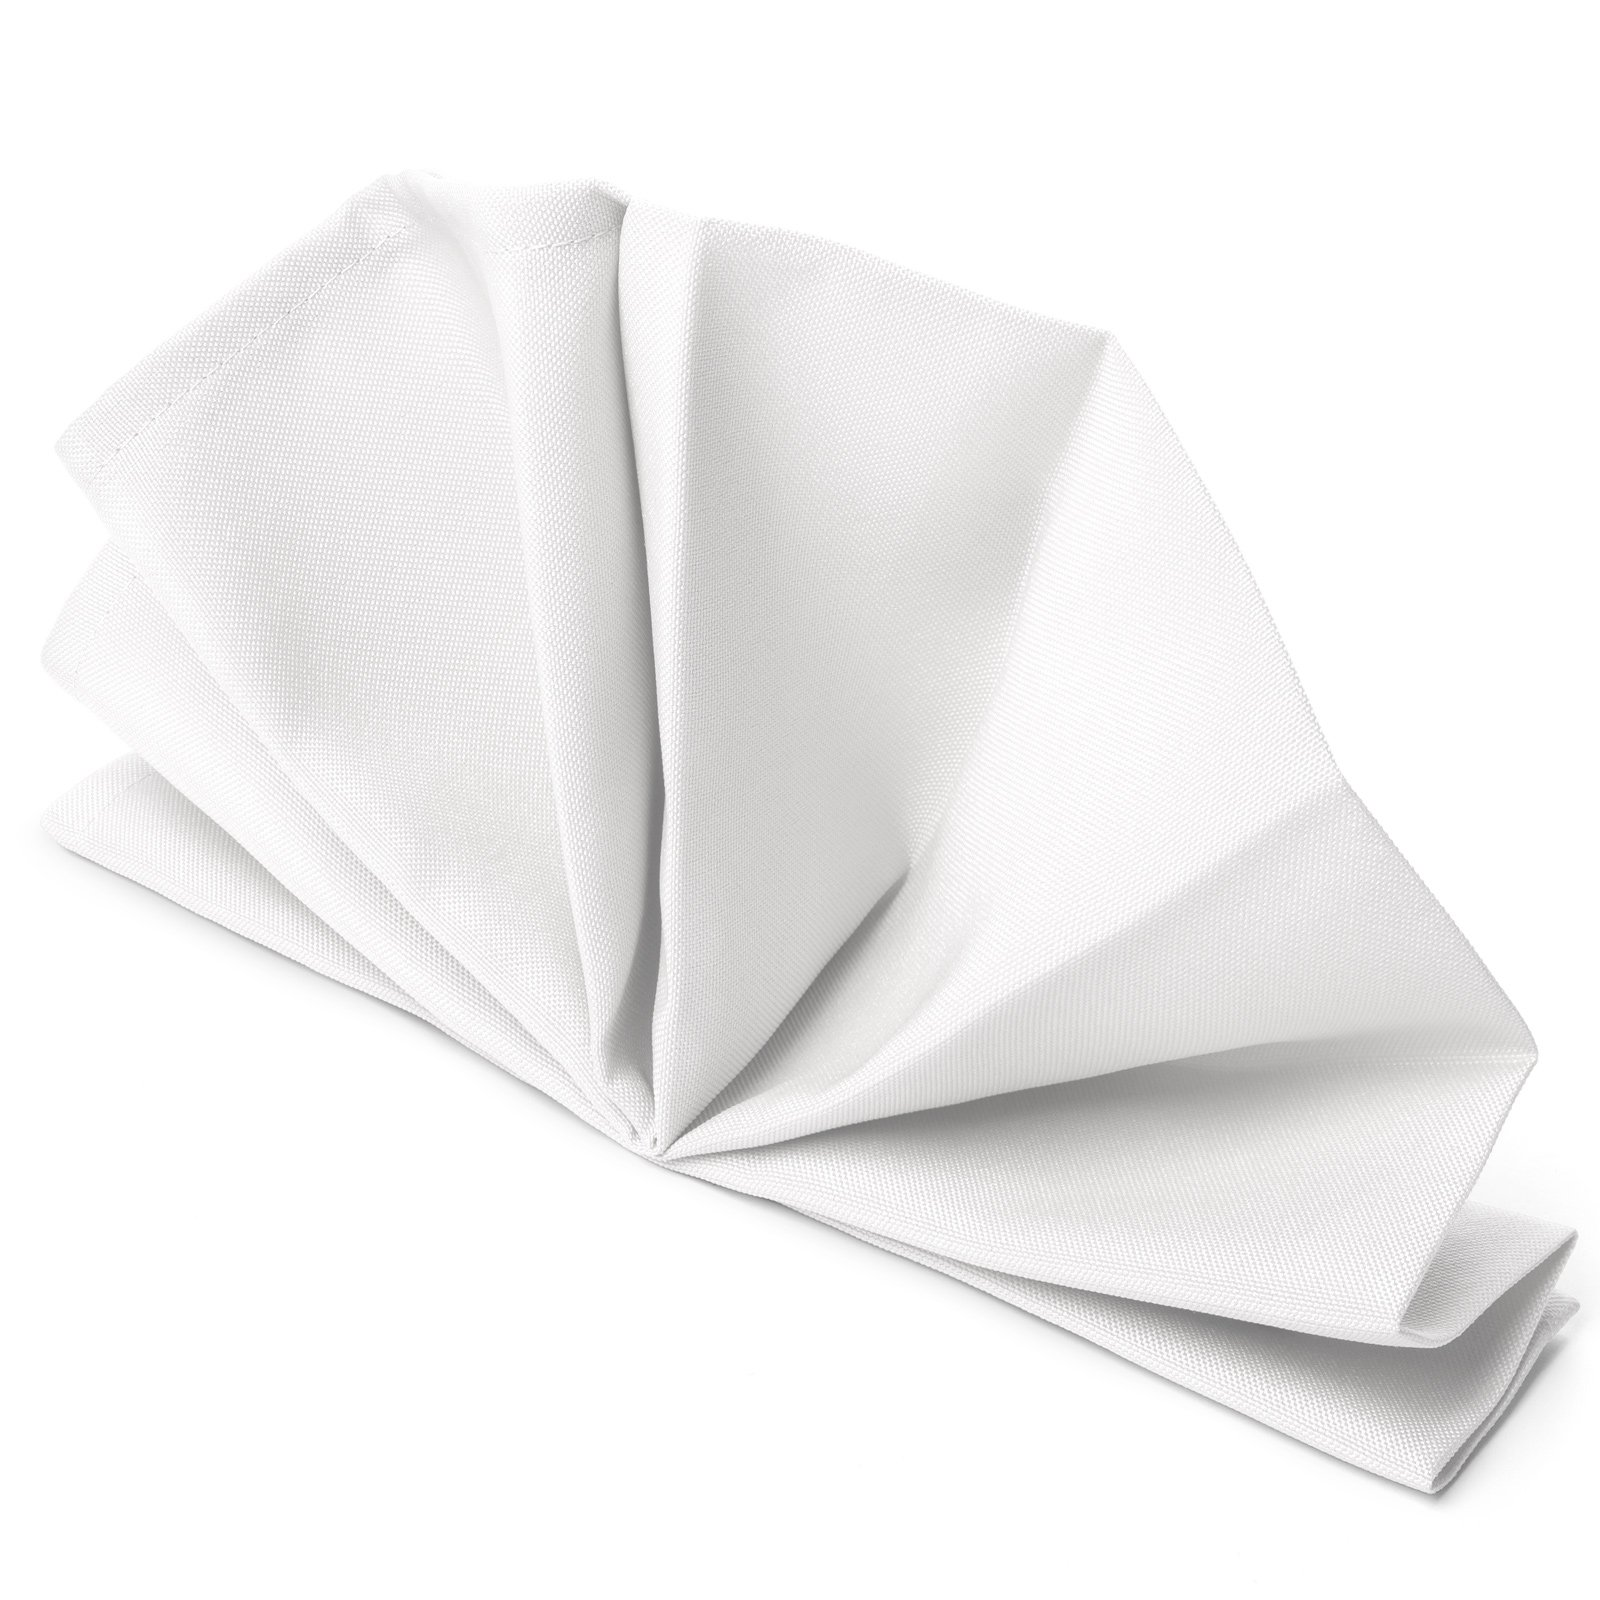 Mill & Thread - 1 Dozen 20'' Oversized Cloth Dinner Table Napkins - Machine Washable Restaurant/Wedding/Hotel Quality Polyester Fabric - White